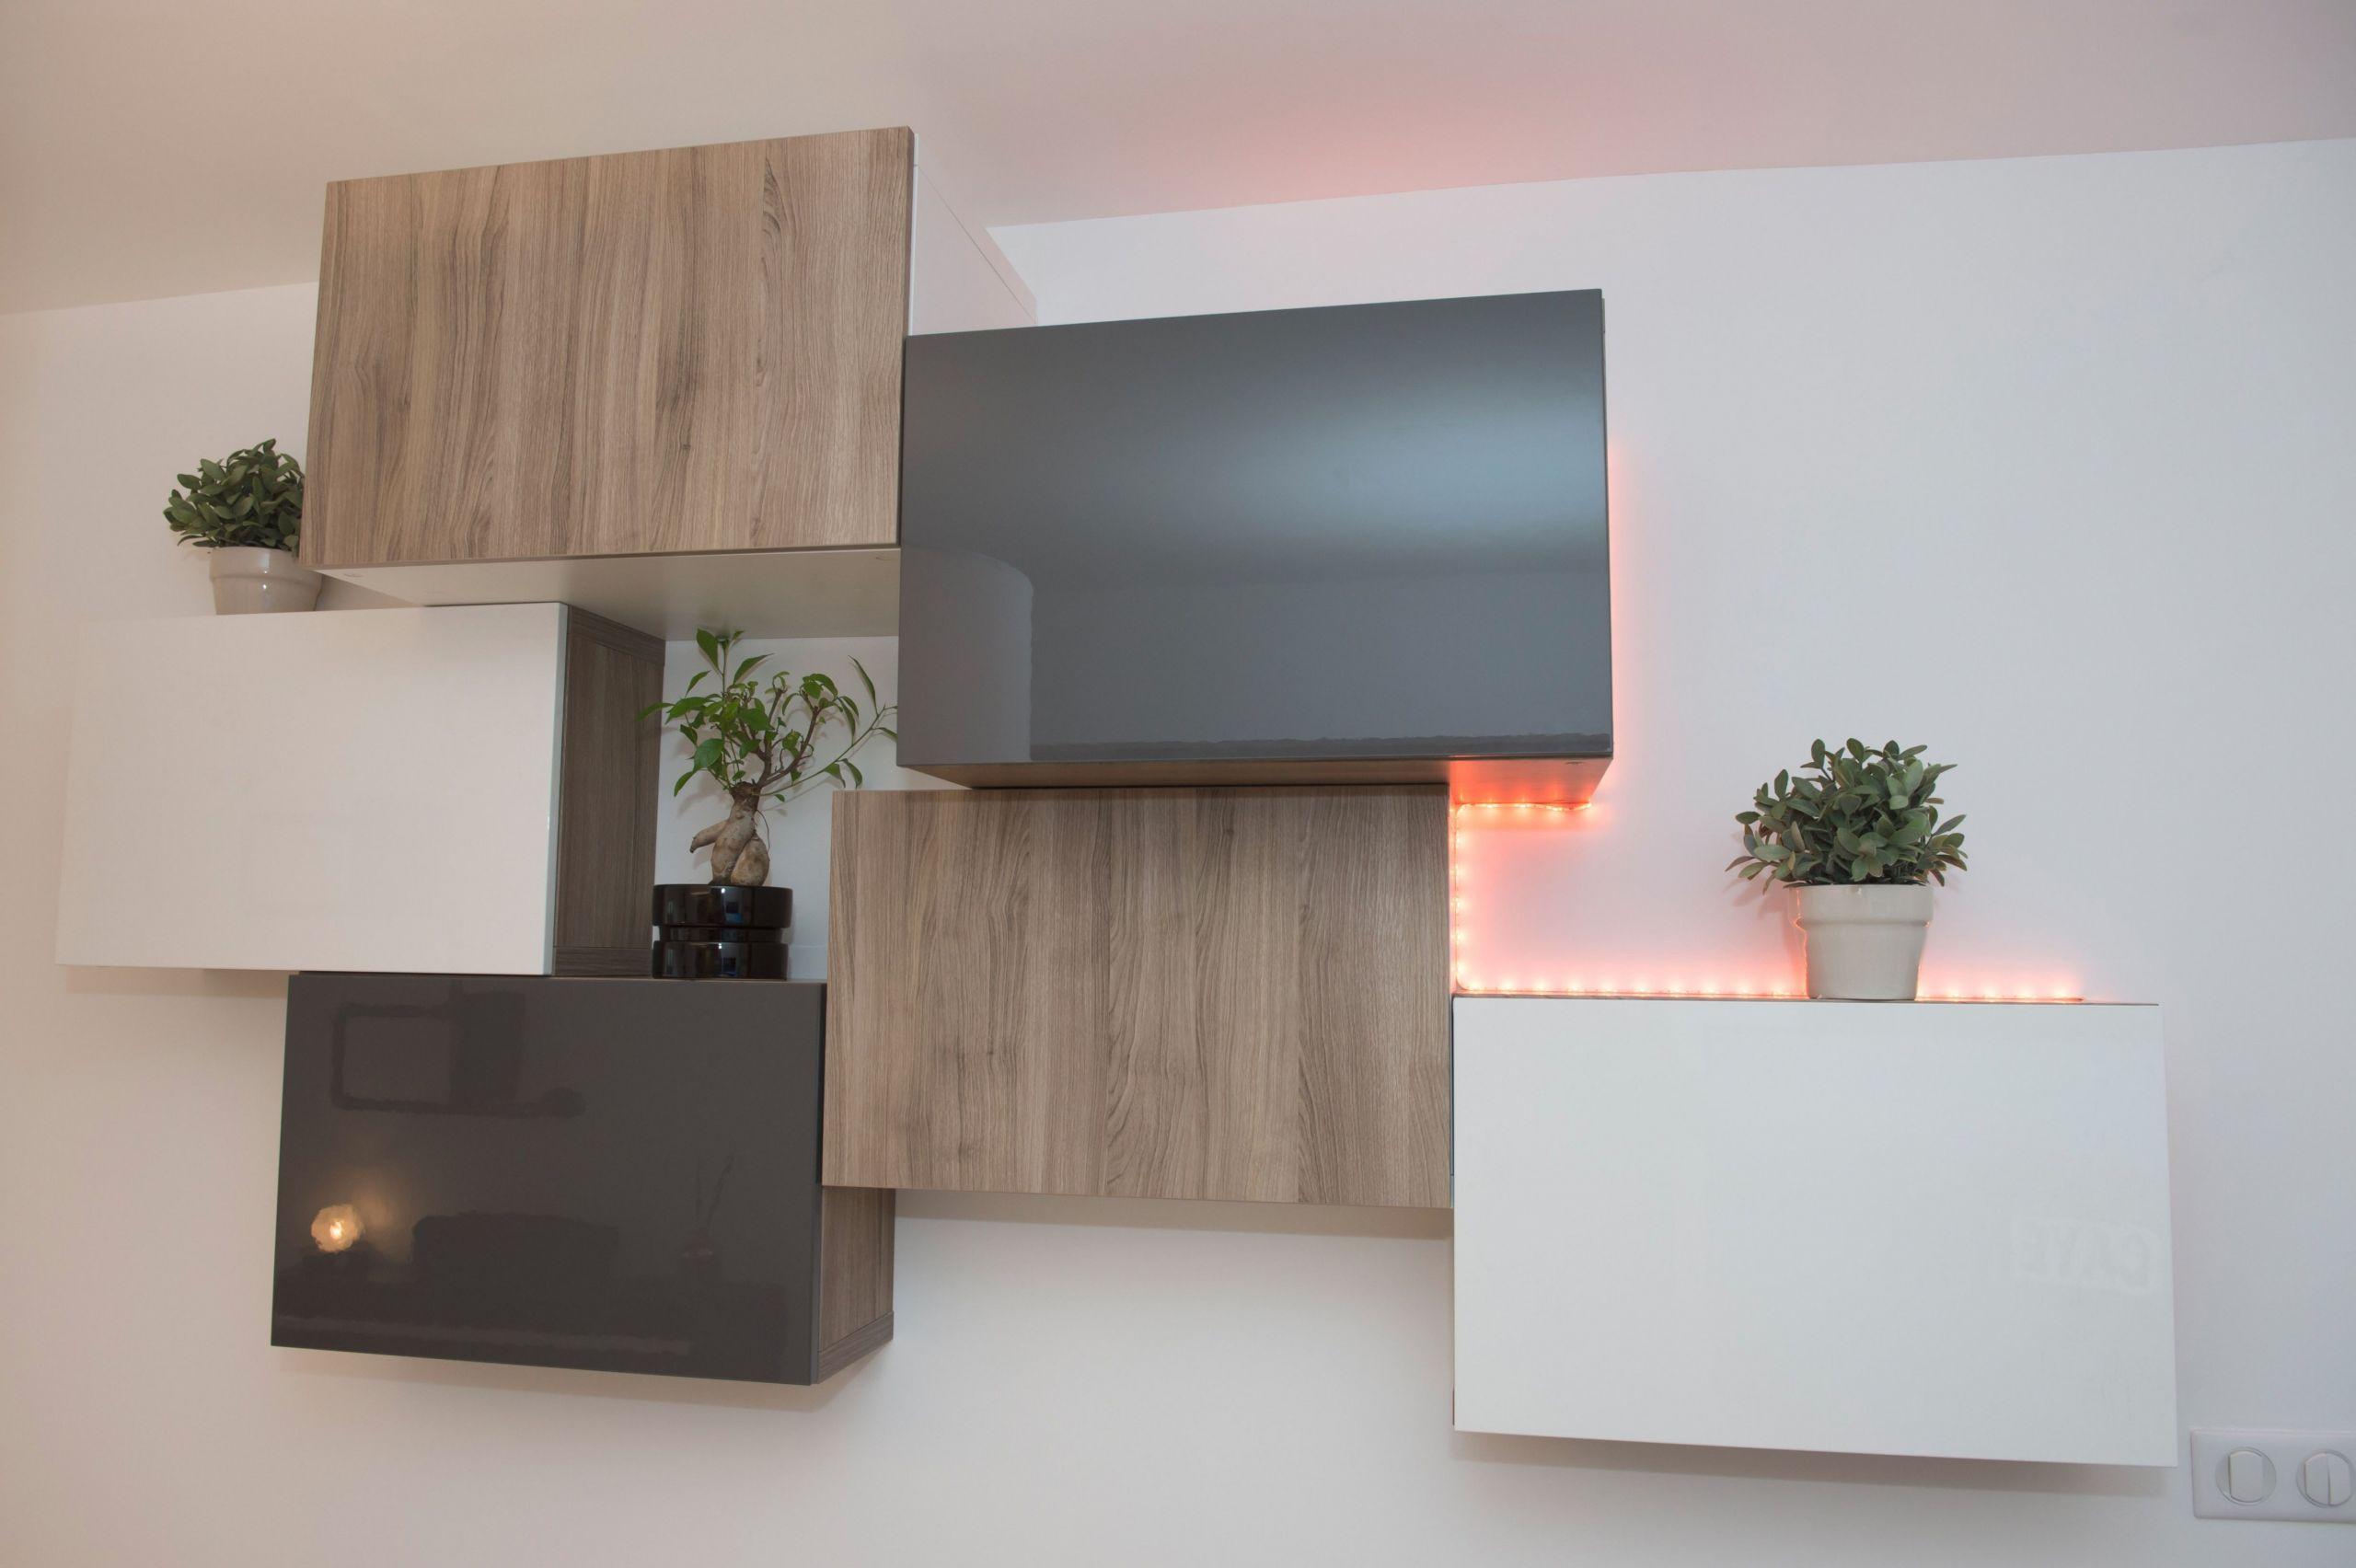 meuble tv haut meuble tele mural beau meuble tv haut meuble tv bois origins meuble of meuble tv haut